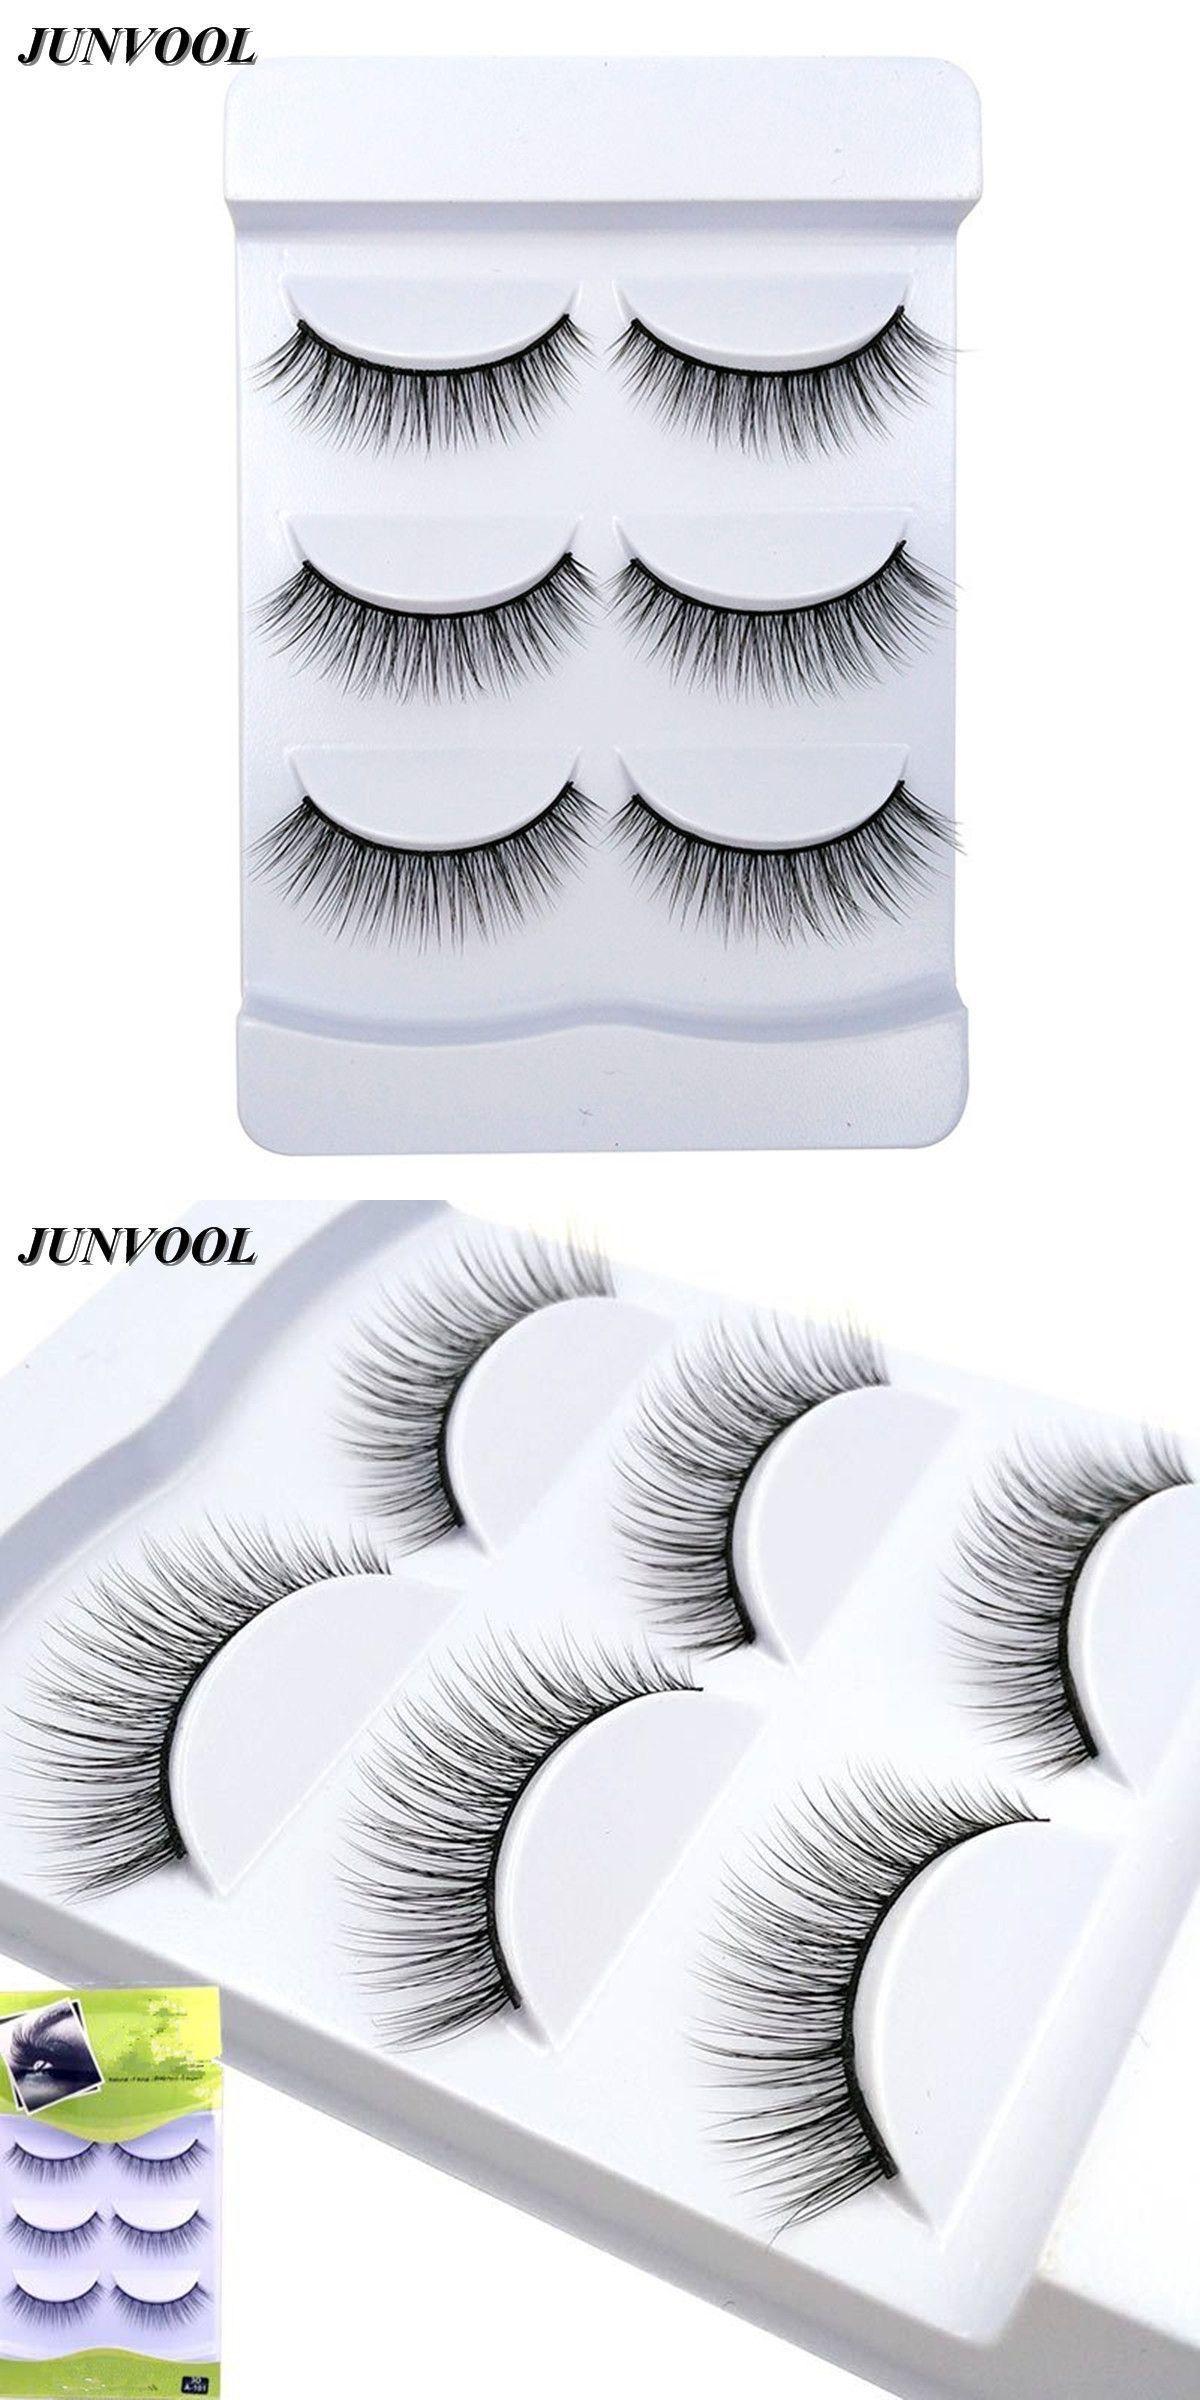 8848eaa5433 3D Mink Lashes 3 Pairs False Eyelashes Natural Makeup Fake Eye Lash Eyelash  Extension Make Up